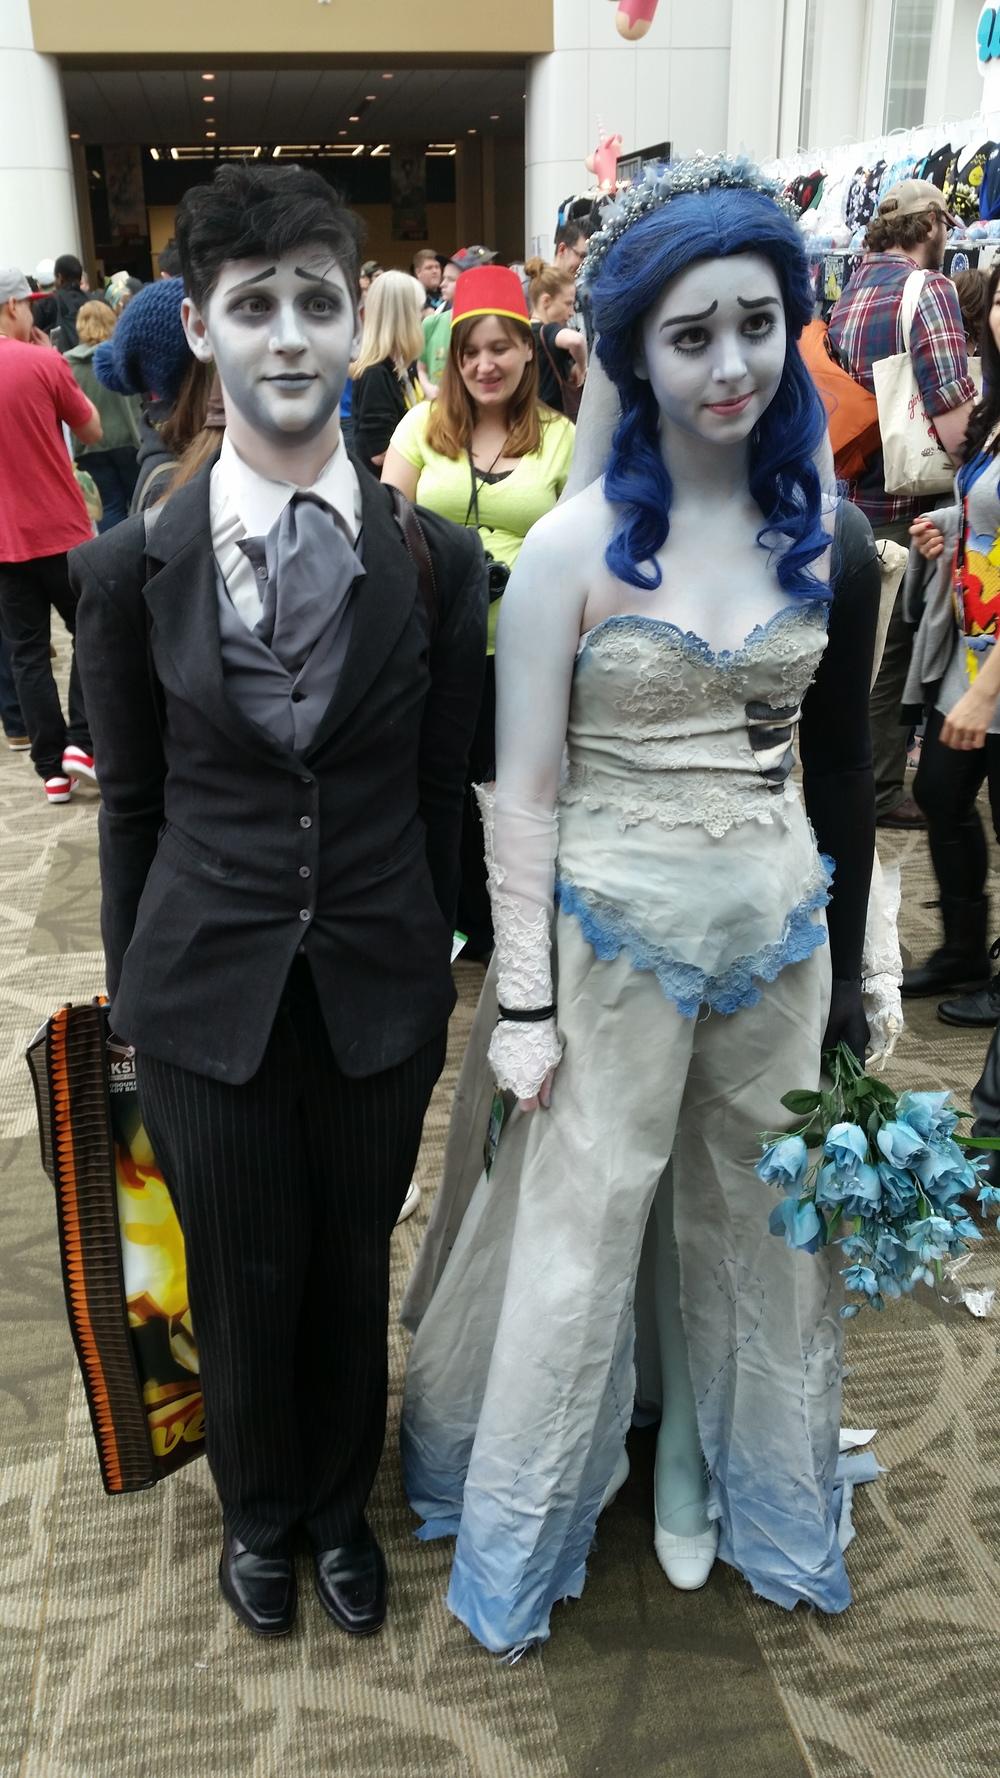 True love always find a way #ECCC #corpsebride #cosplay